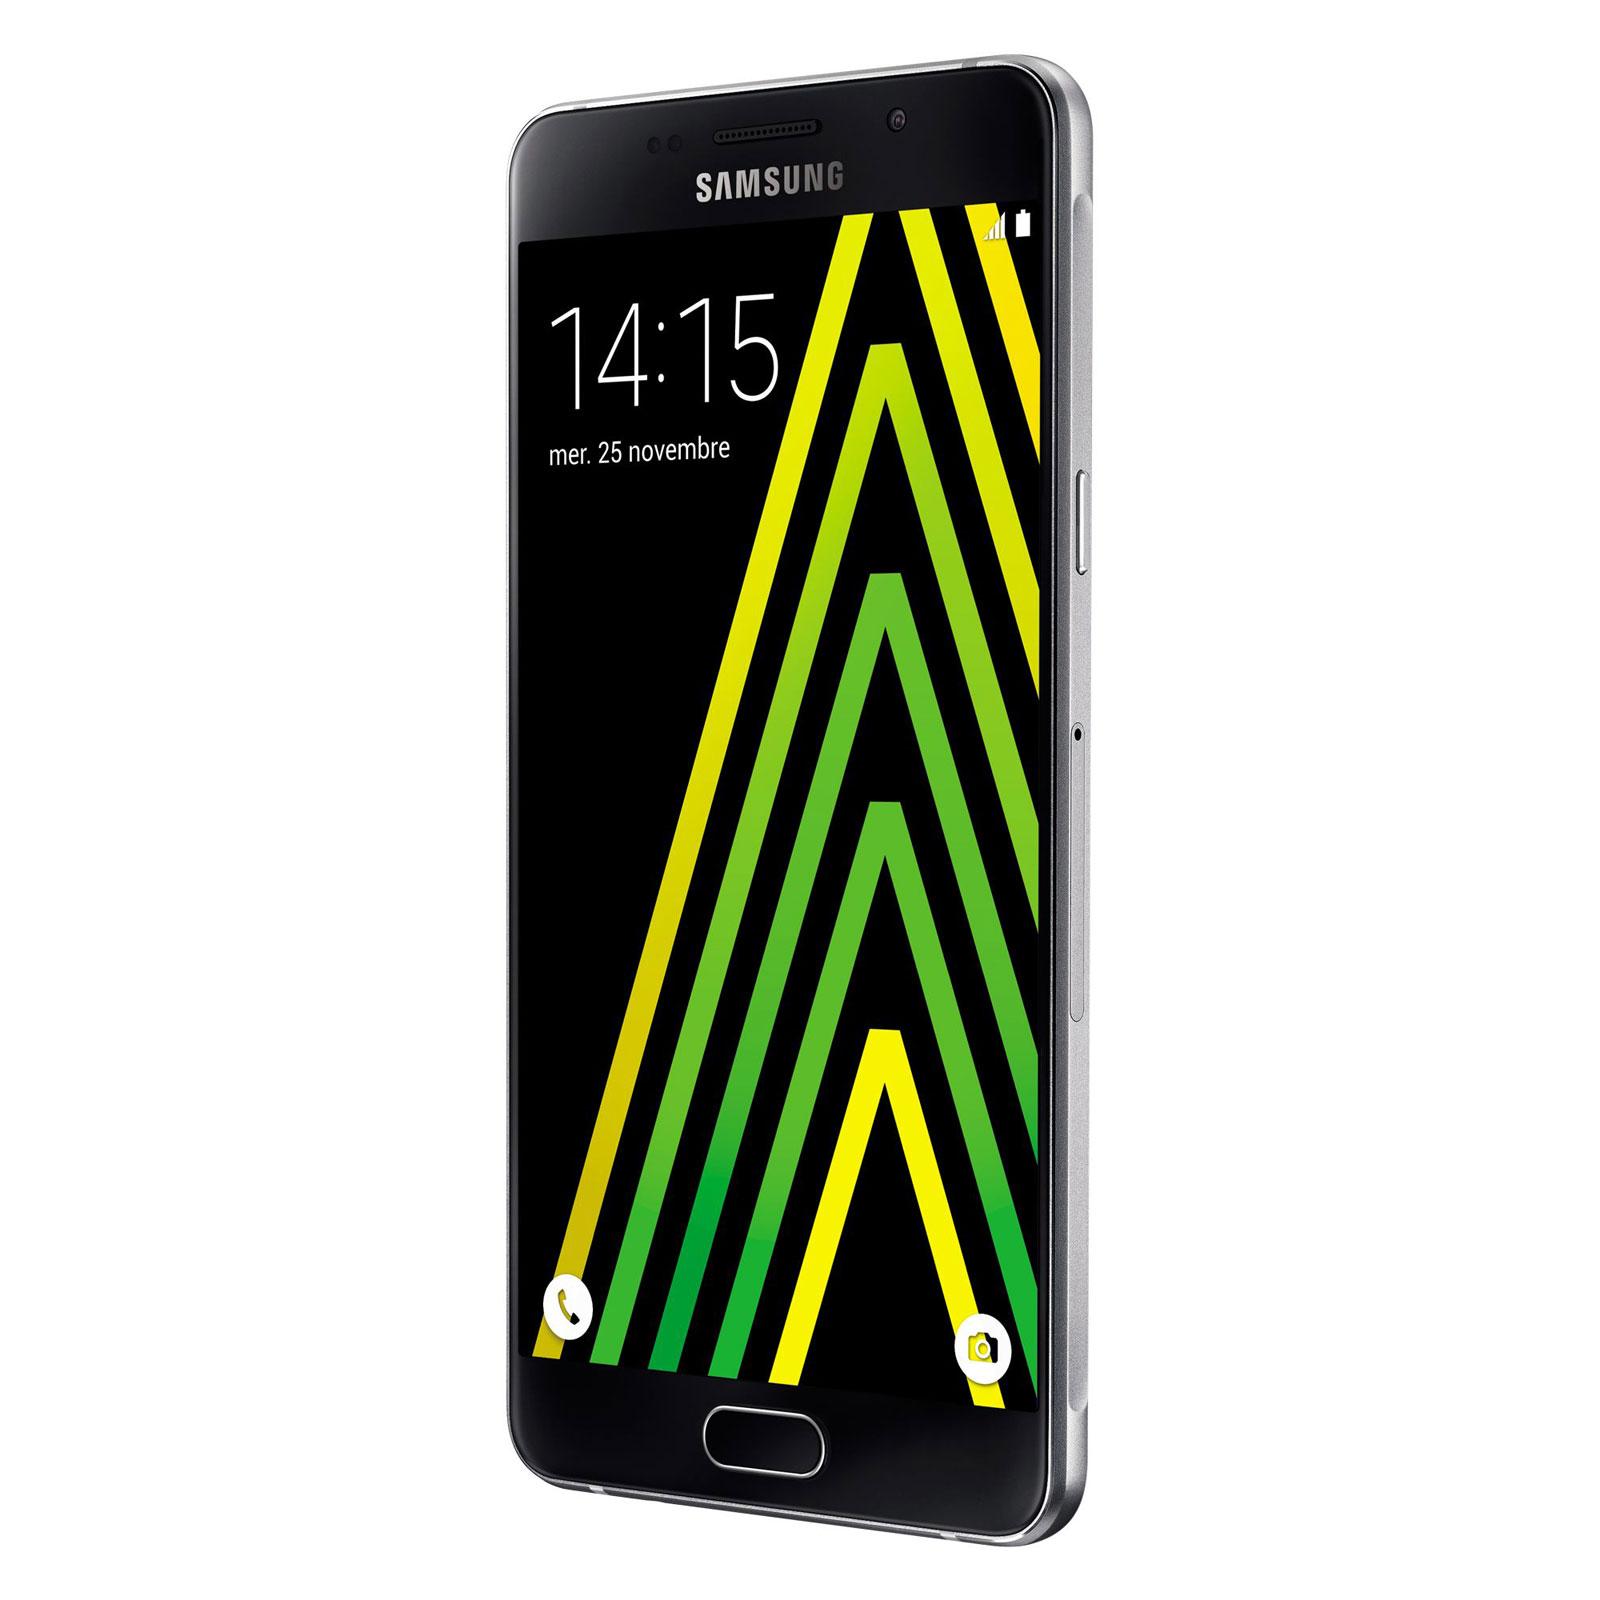 Très Samsung Galaxy A5 2016 Noir - Mobile & smartphone Samsung sur LDLC.com ZO63